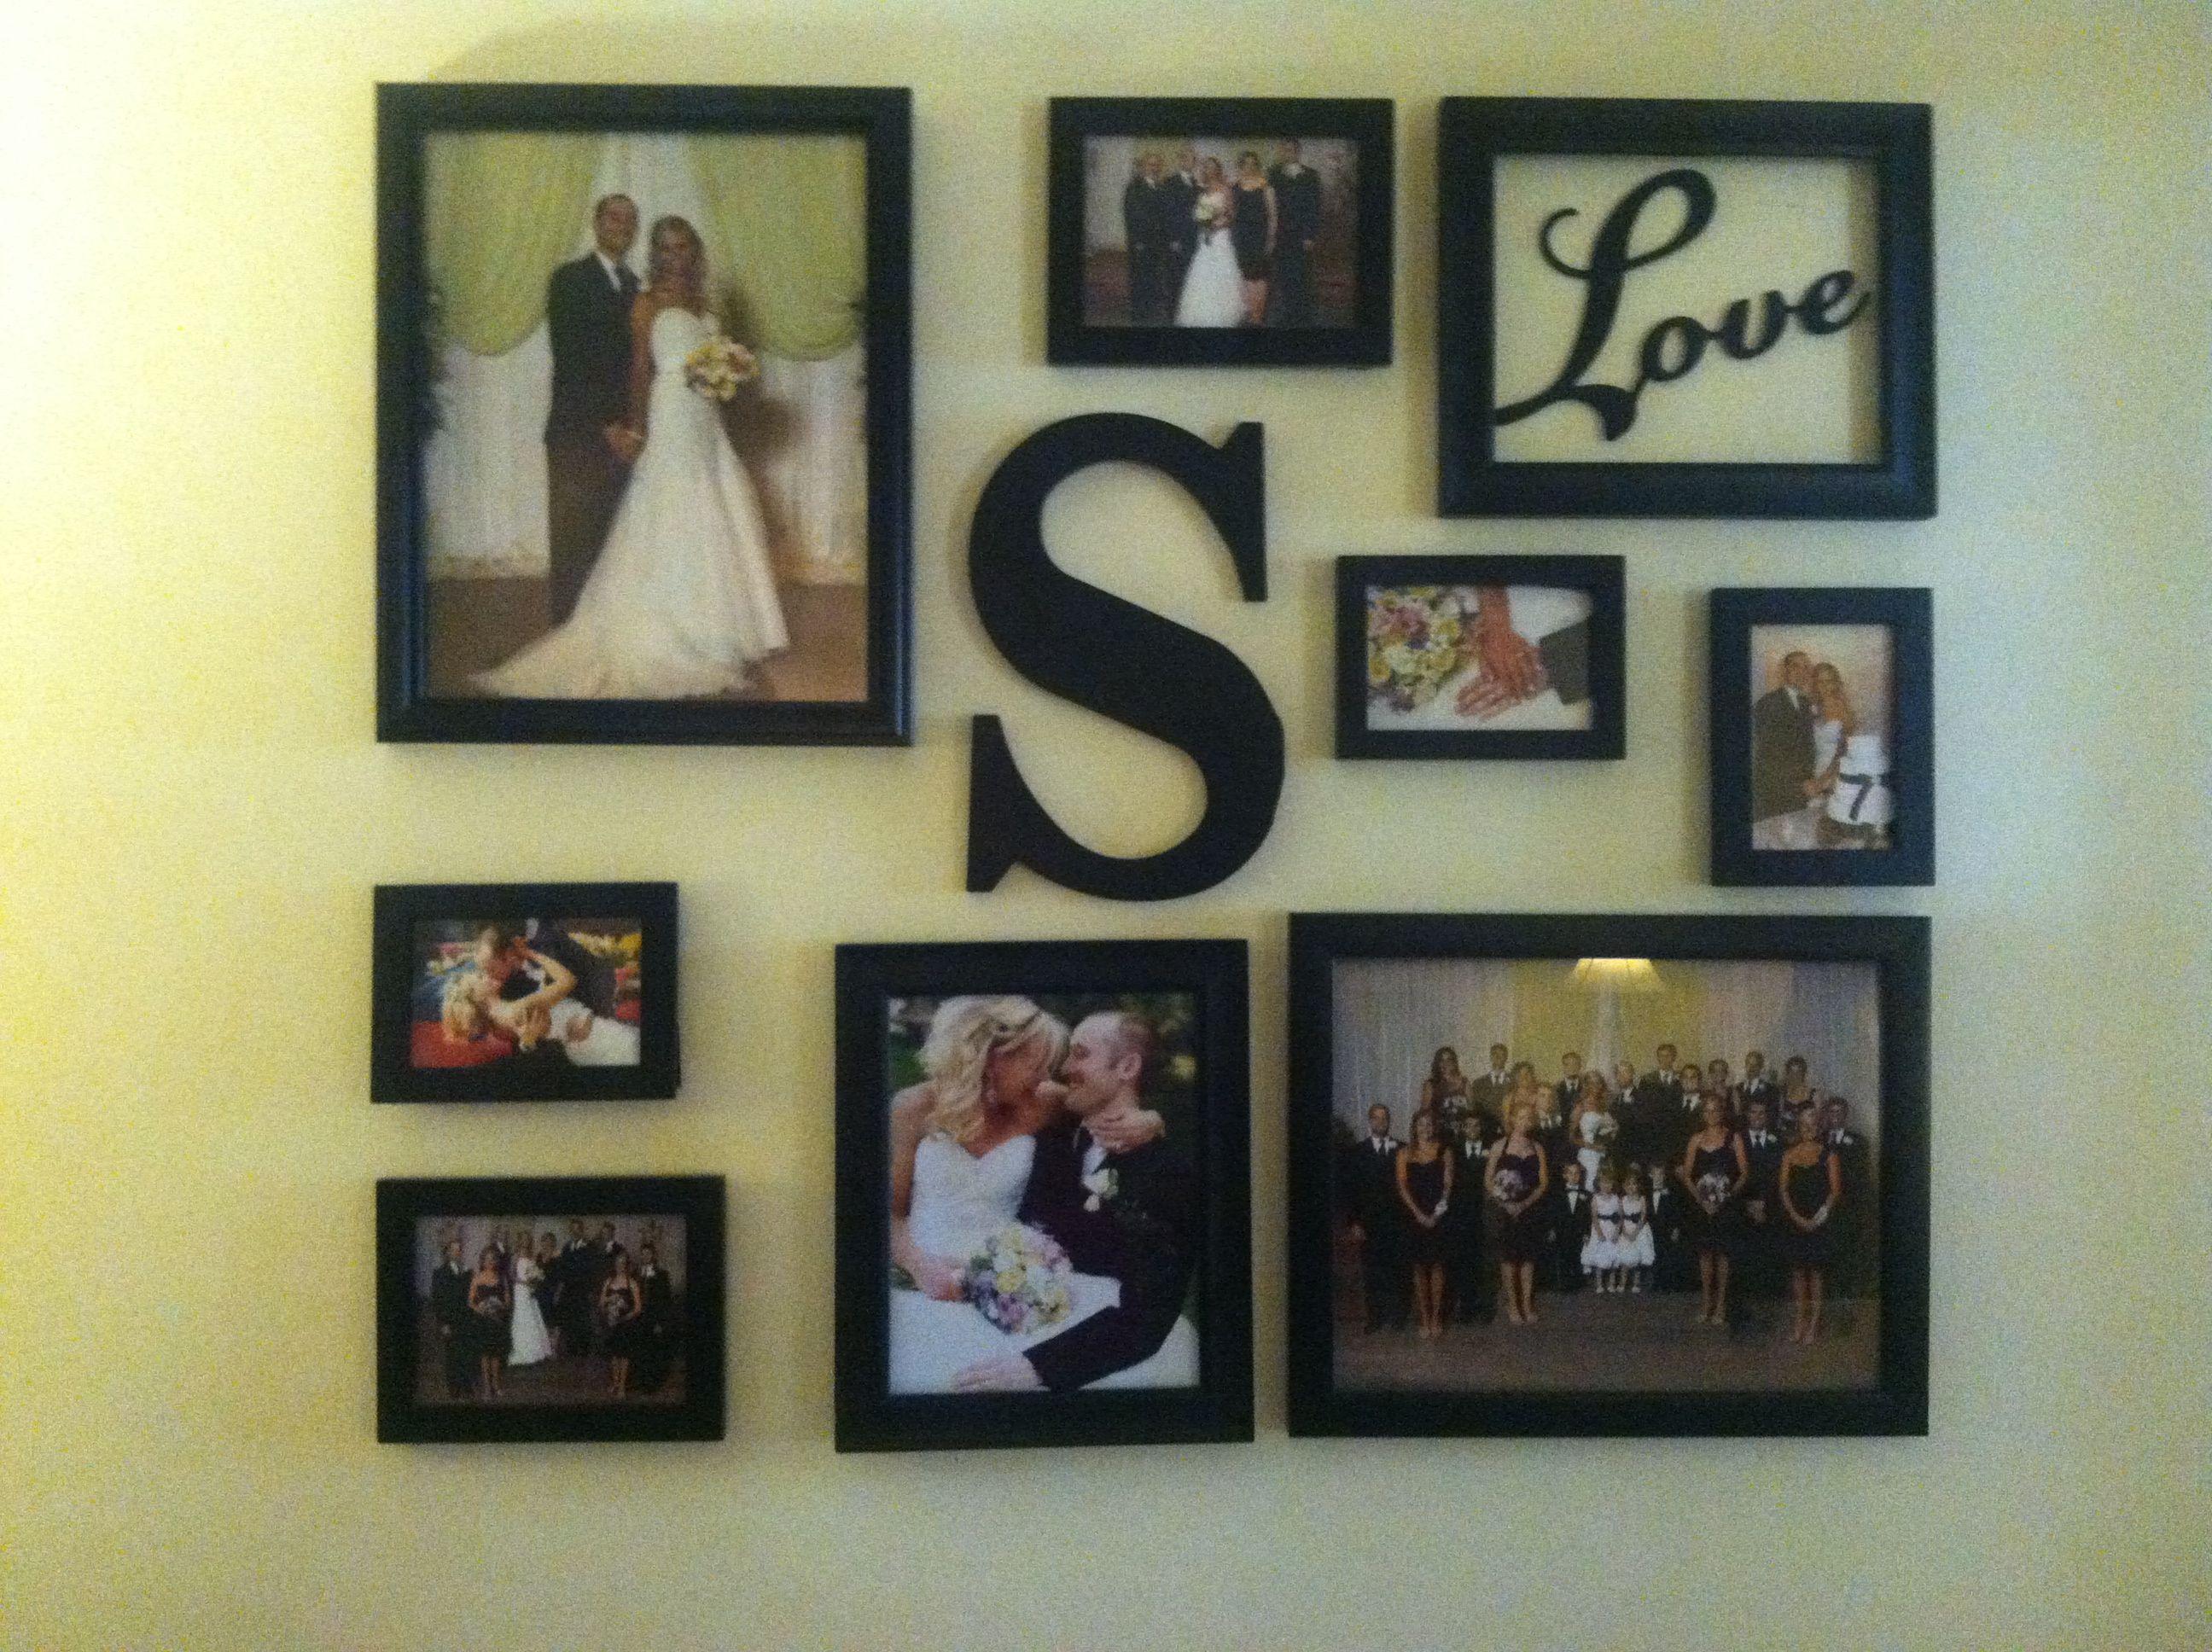 Our Wedding Photo Collage! @Cheri Edwards Bergman My